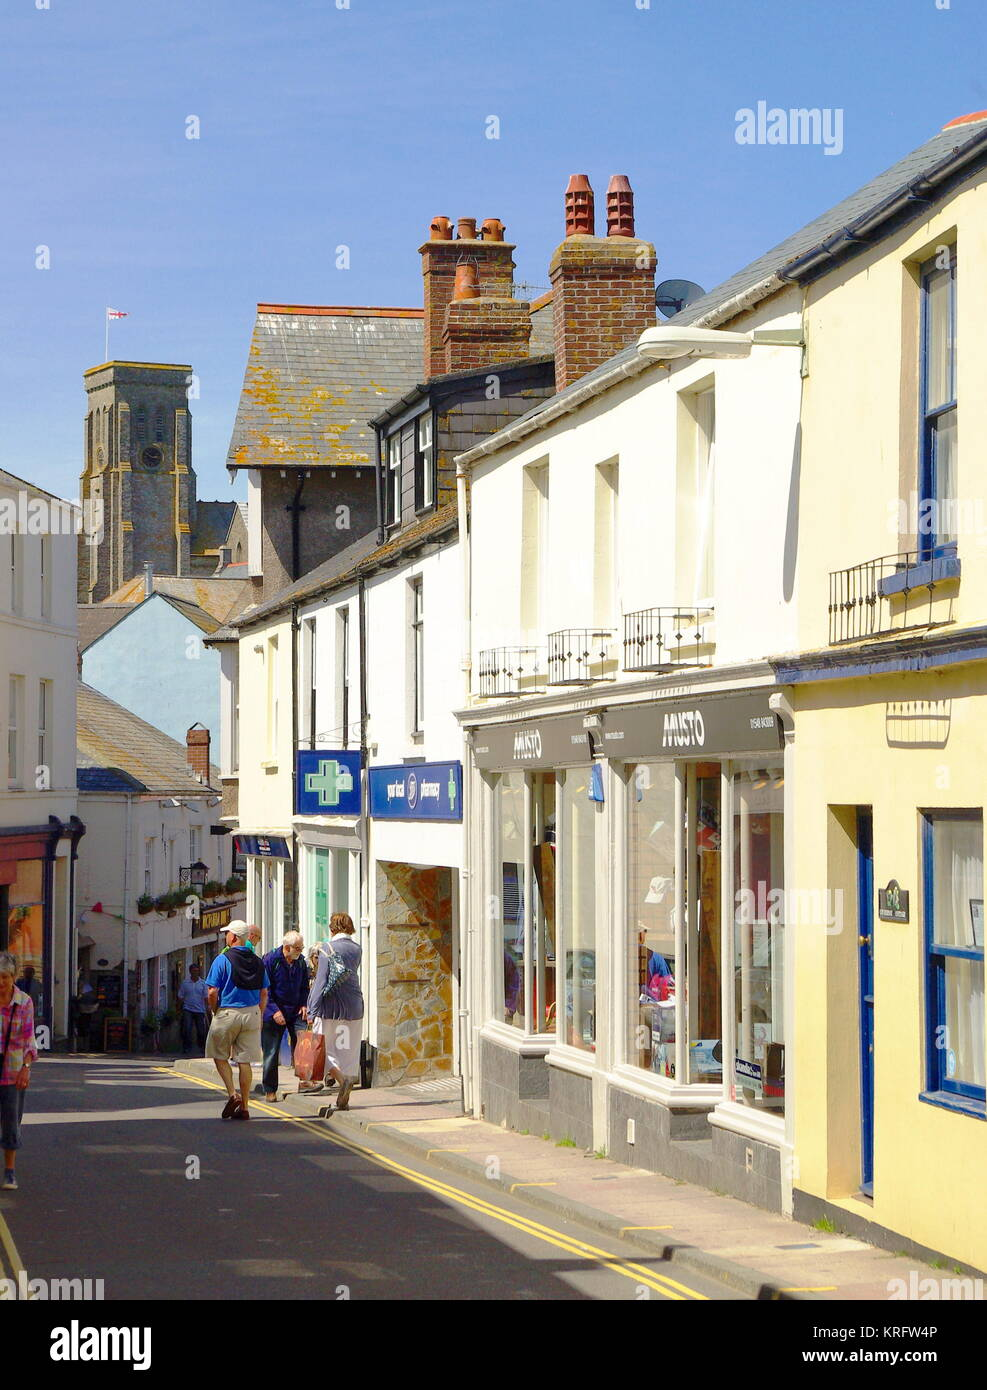 Una angosta calle comercial en Salcombe, Devon. Fecha: 2014 Imagen De Stock